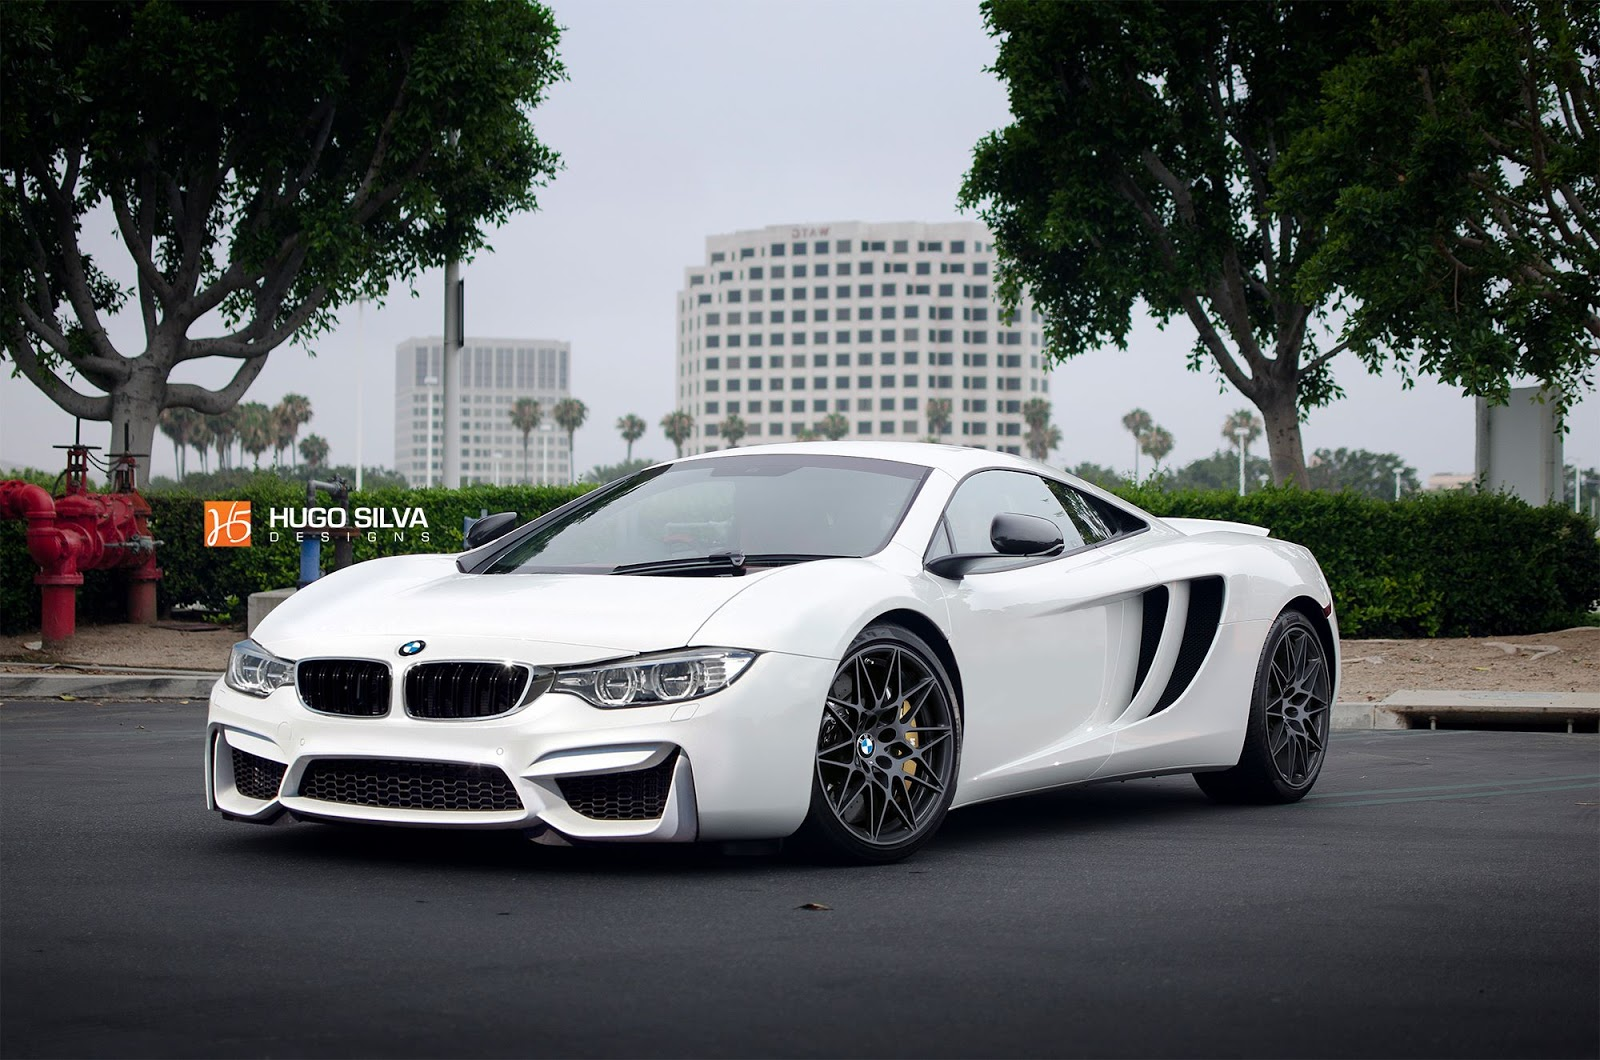 This BMW/McLaren Supercar Mashup Doesn't Look Half Bad